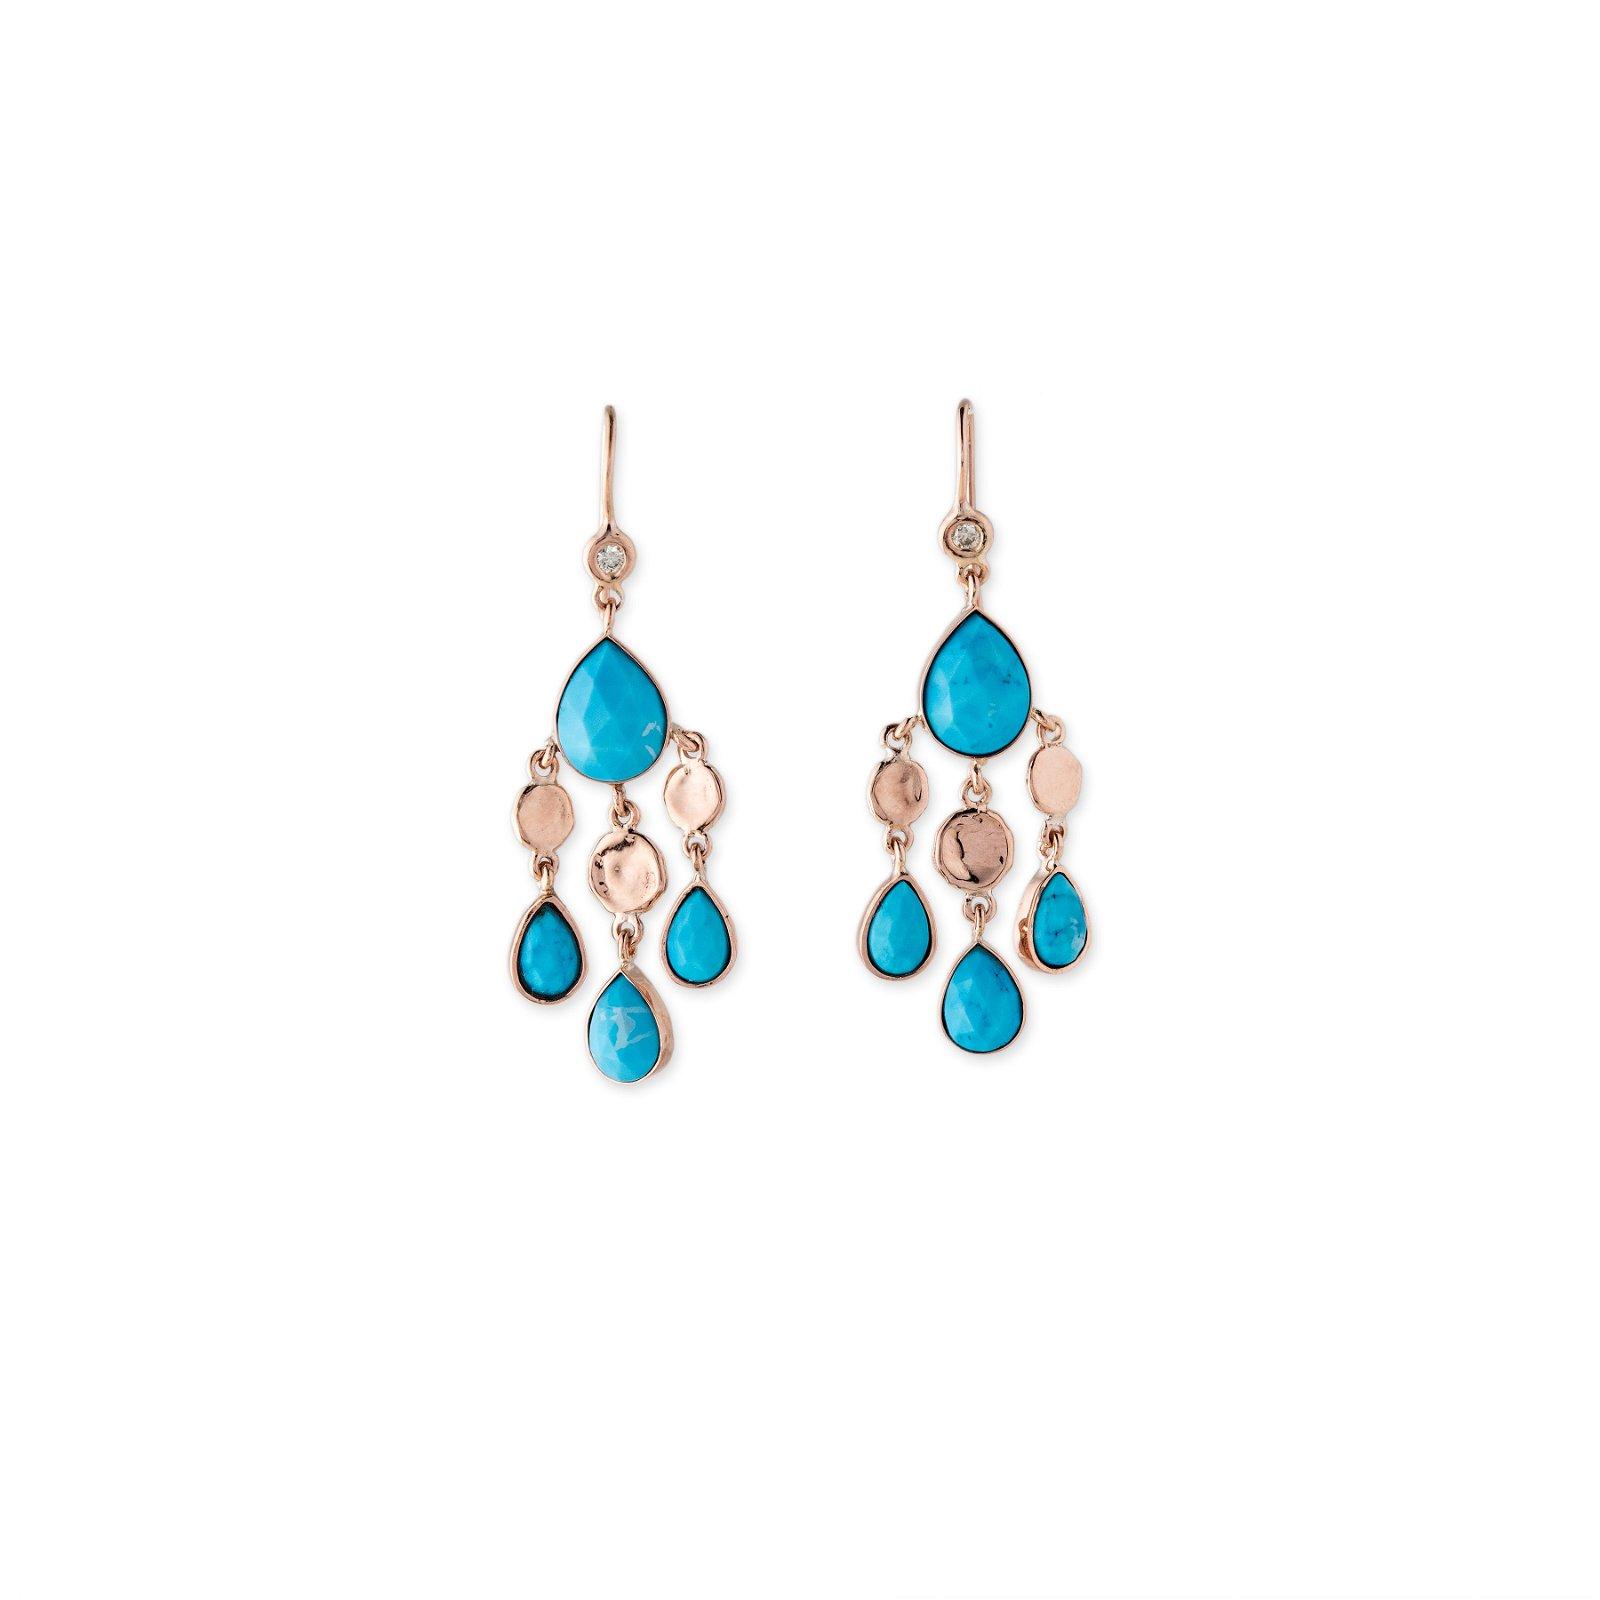 Image of Turquoise Teardrop Disc Drop Earrings